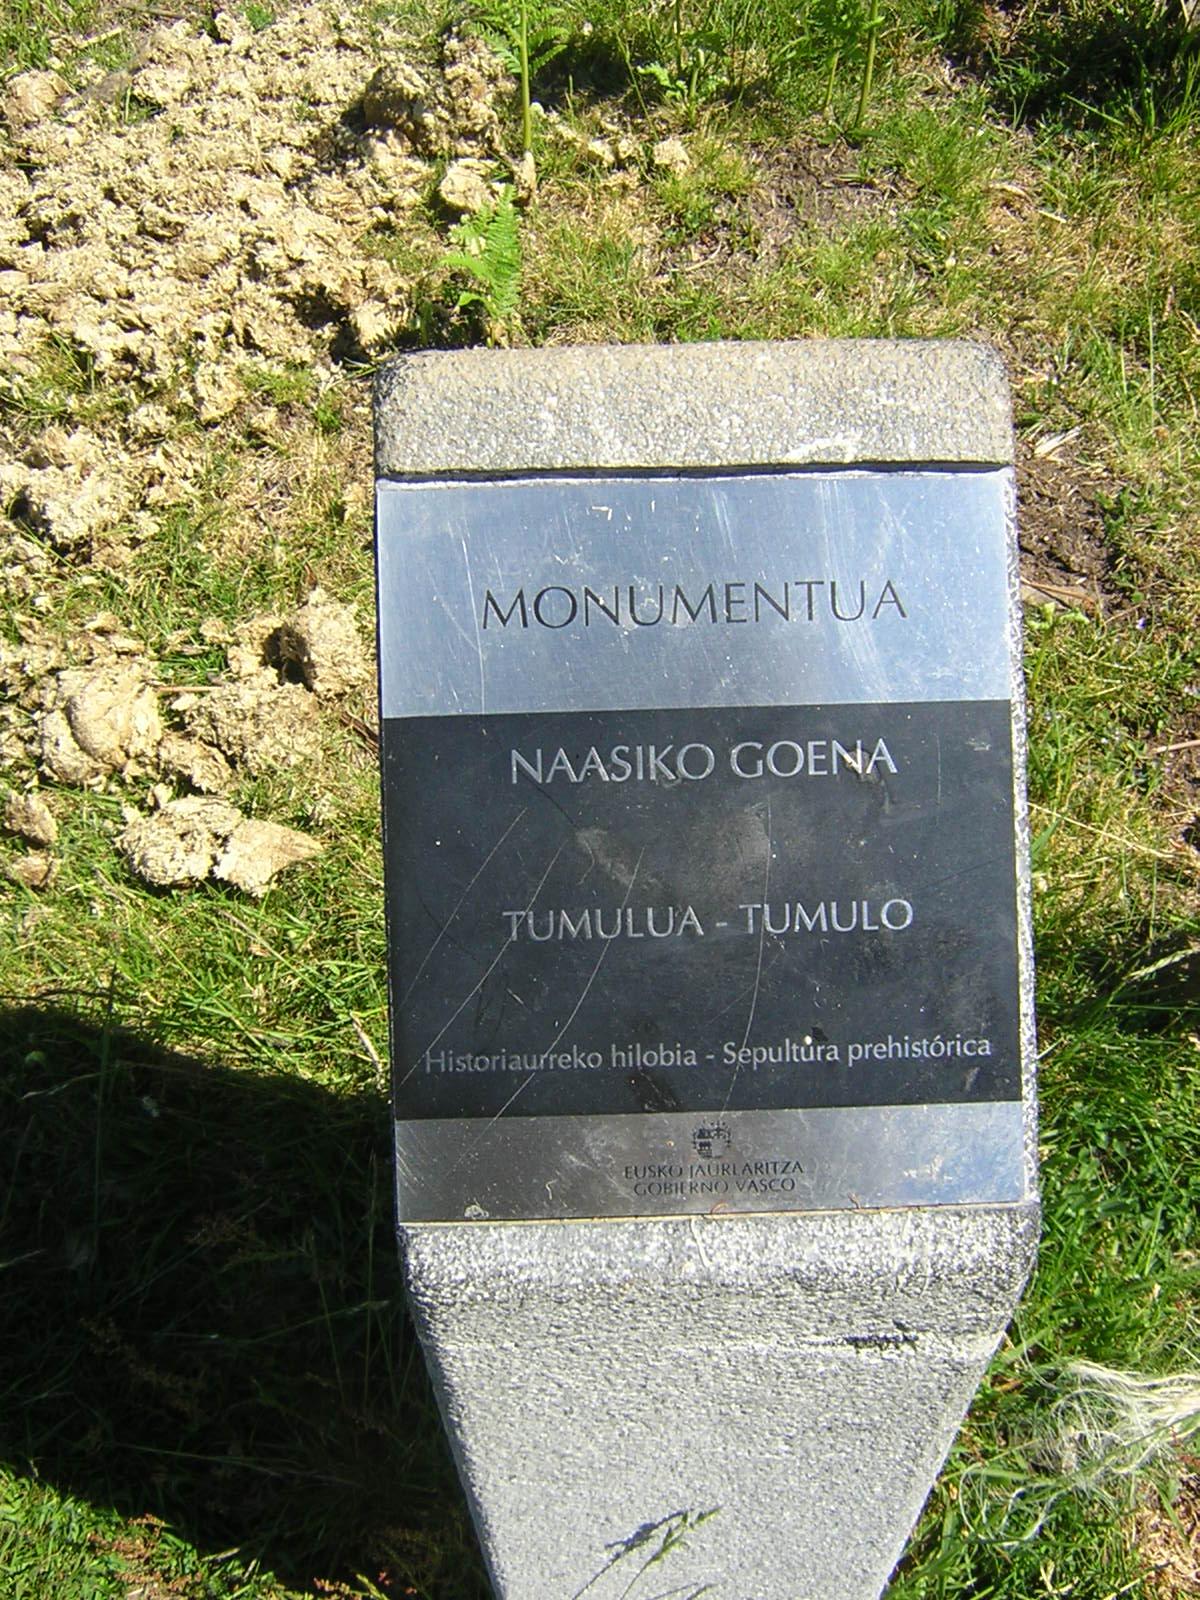 Túmulo Naasiko goena Tumuloa